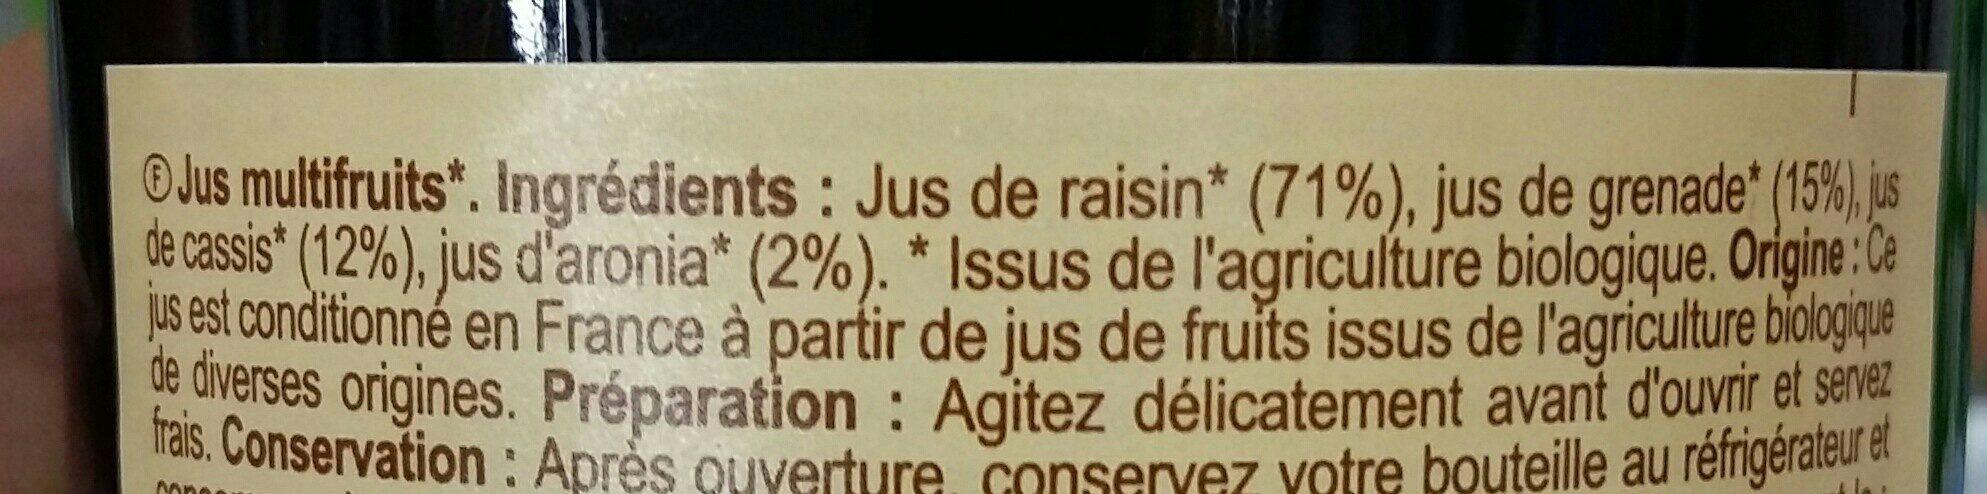 100% pur fruits pressés - Ingredienti - fr